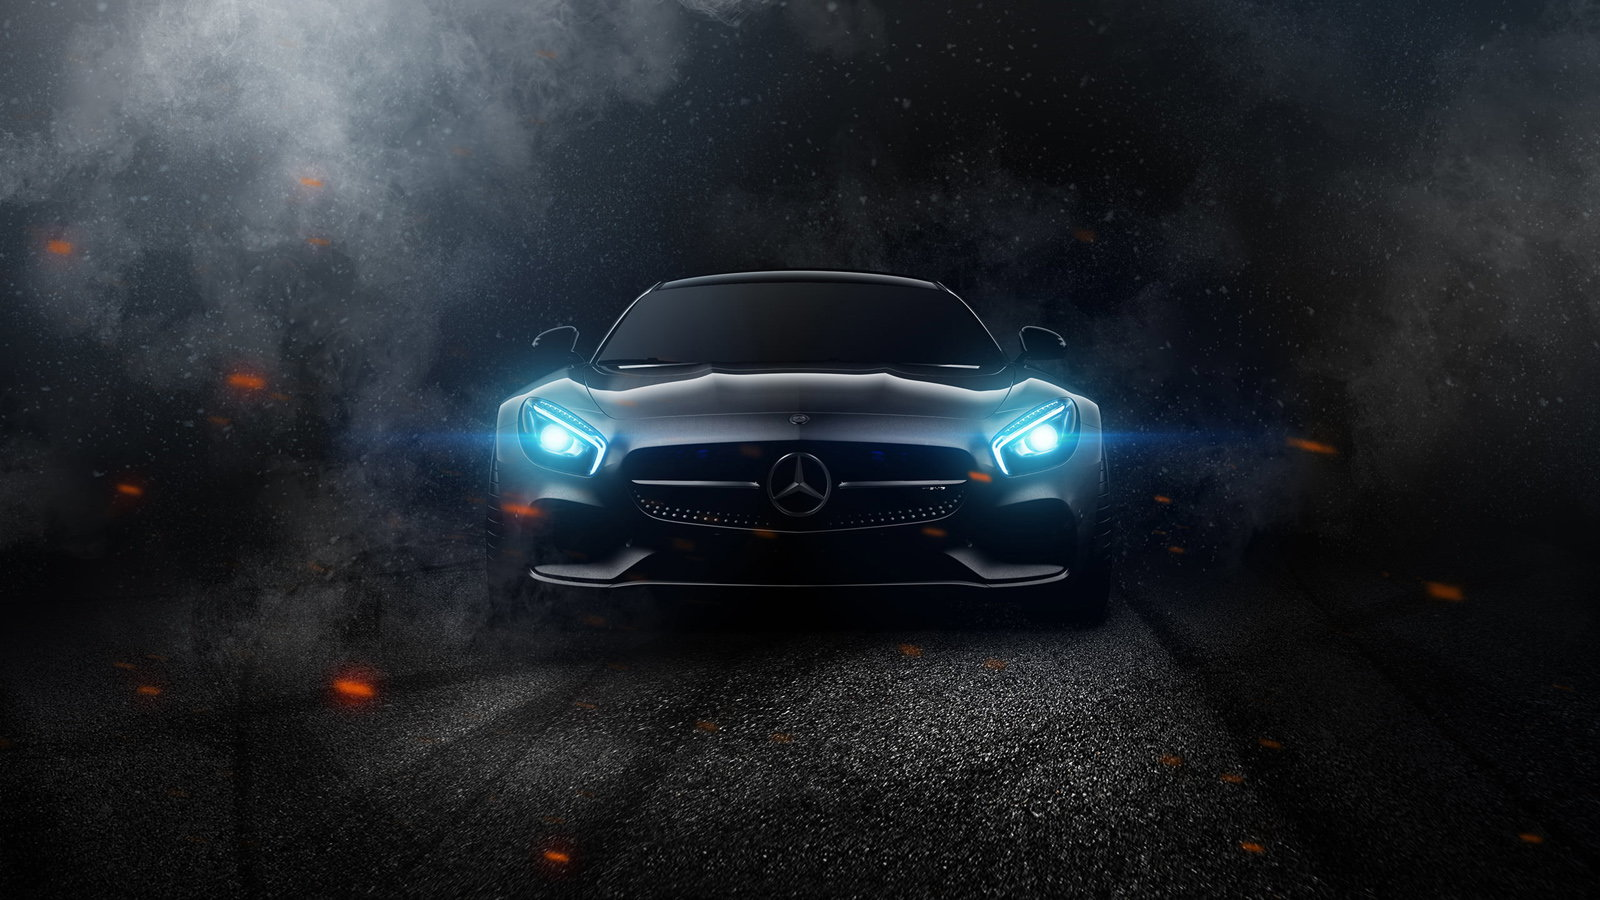 Driving Through a Fiery Hell